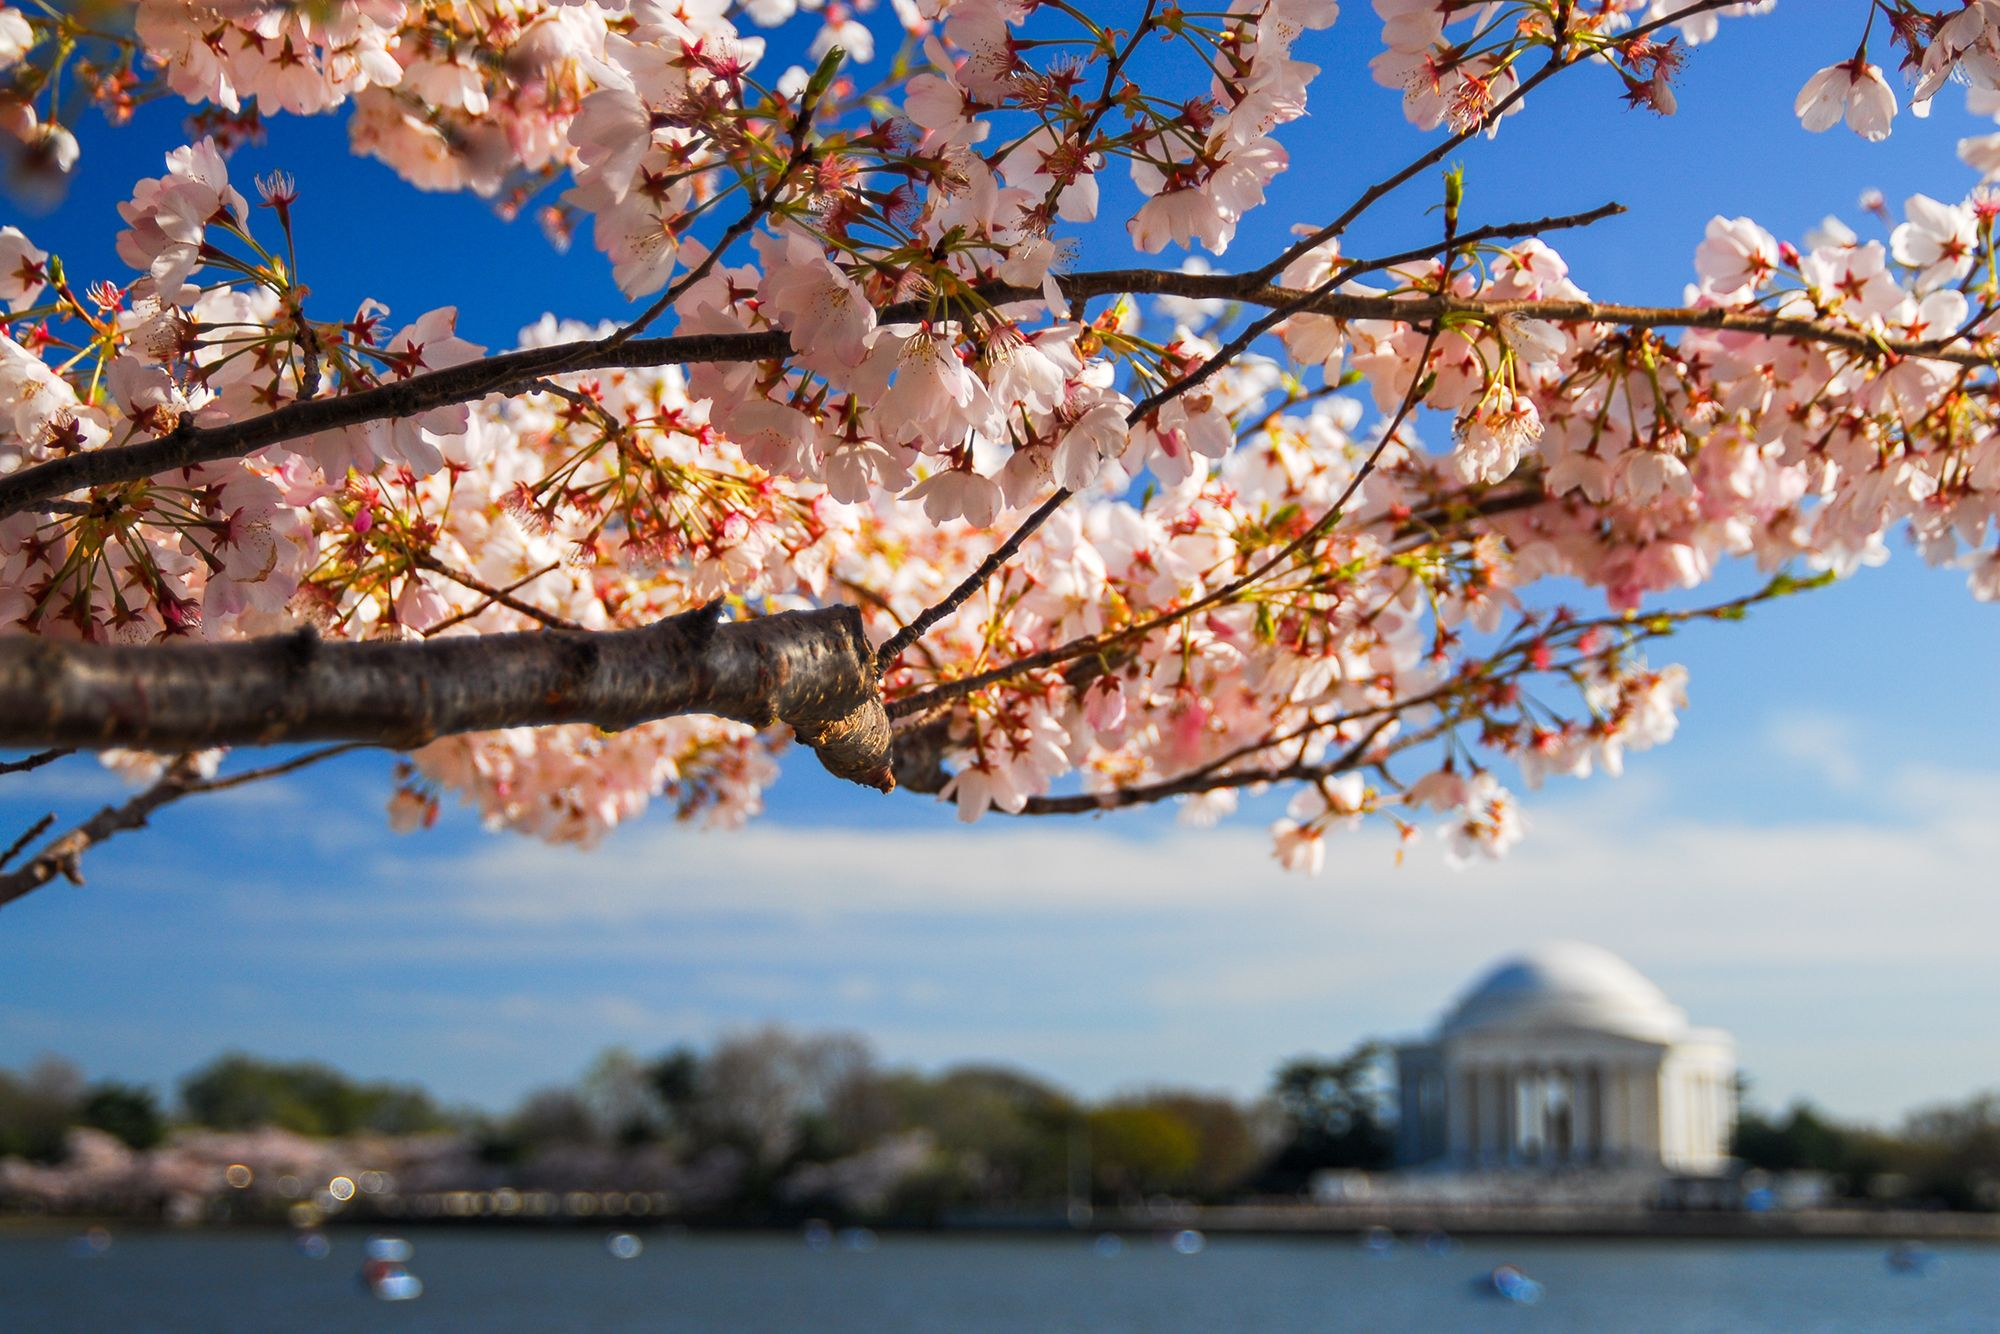 Washington D C S Cherry Blossom Bloom To Peak In April This Year National Parks Cherry Blossom Yoshino Cherry Tree